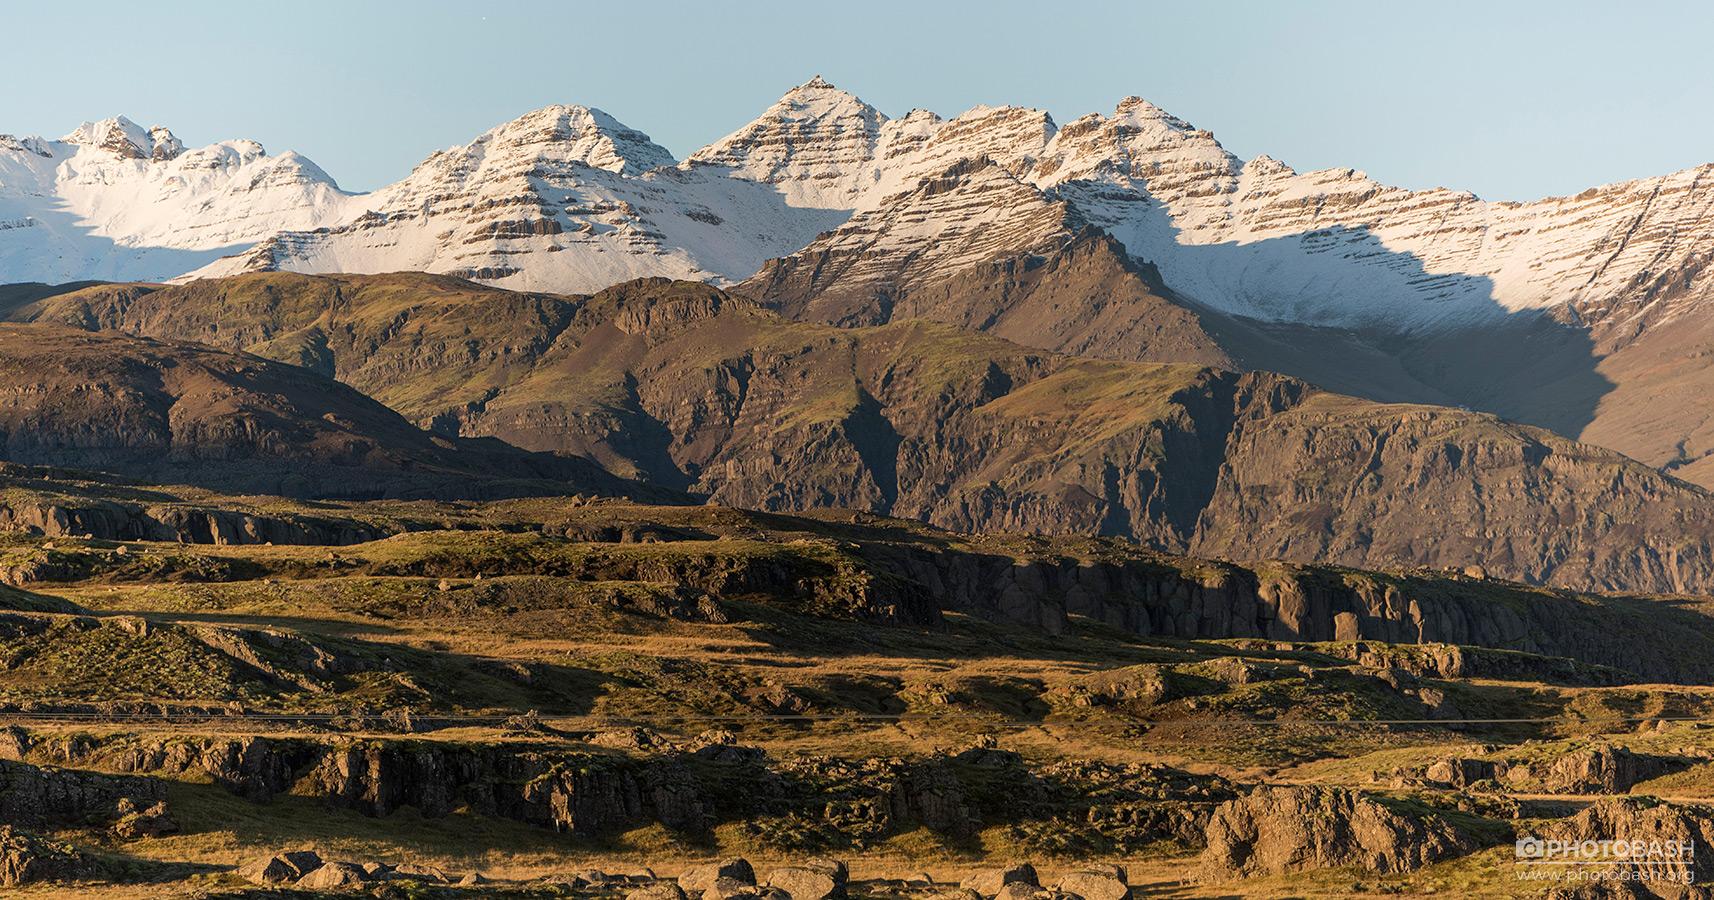 Iceland-Mountains-Epic-Snowy-Peaks.jpg